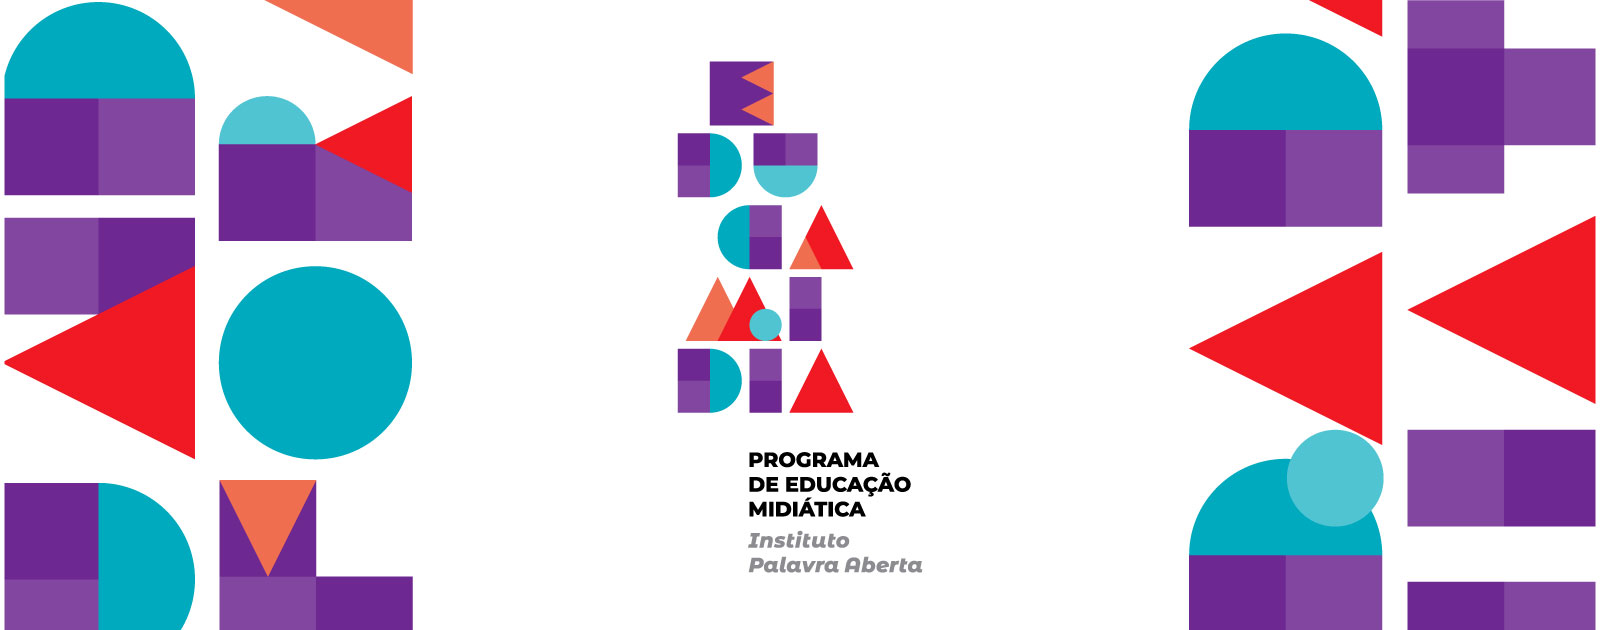 Habilidades | Educamídia